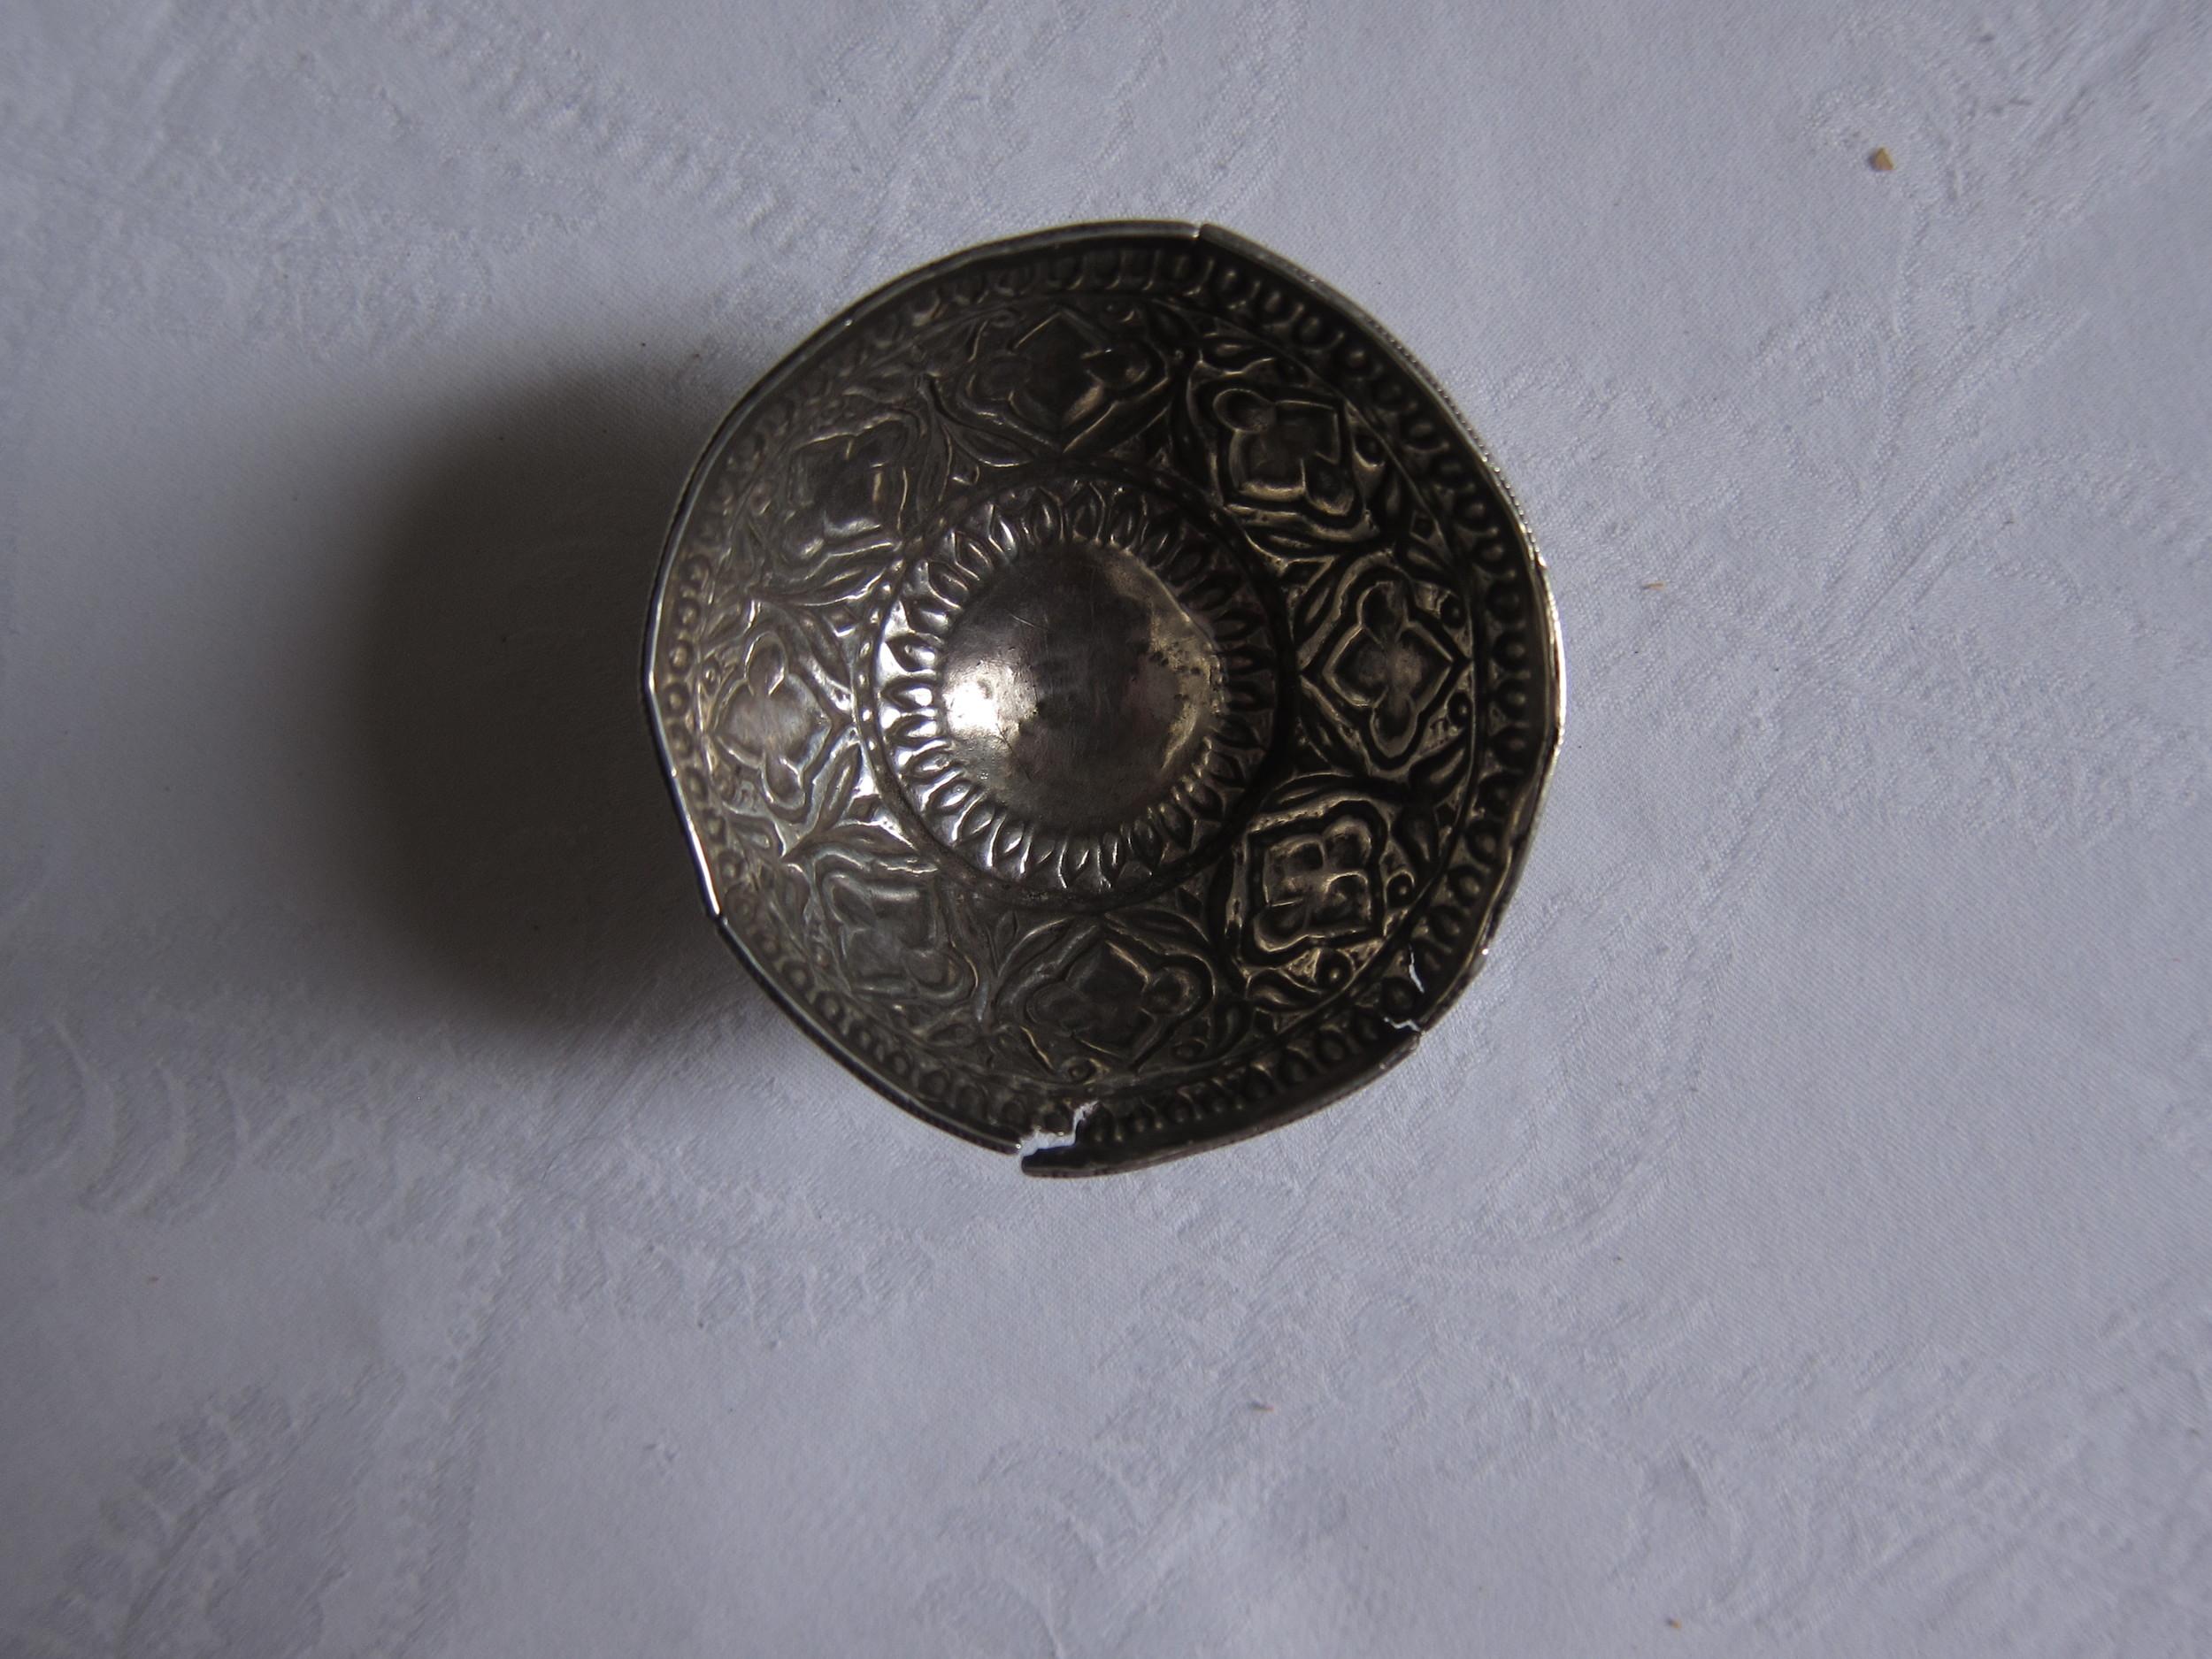 Broken Kiddush cup, Baghdad, Iraq, ca. 19th century.